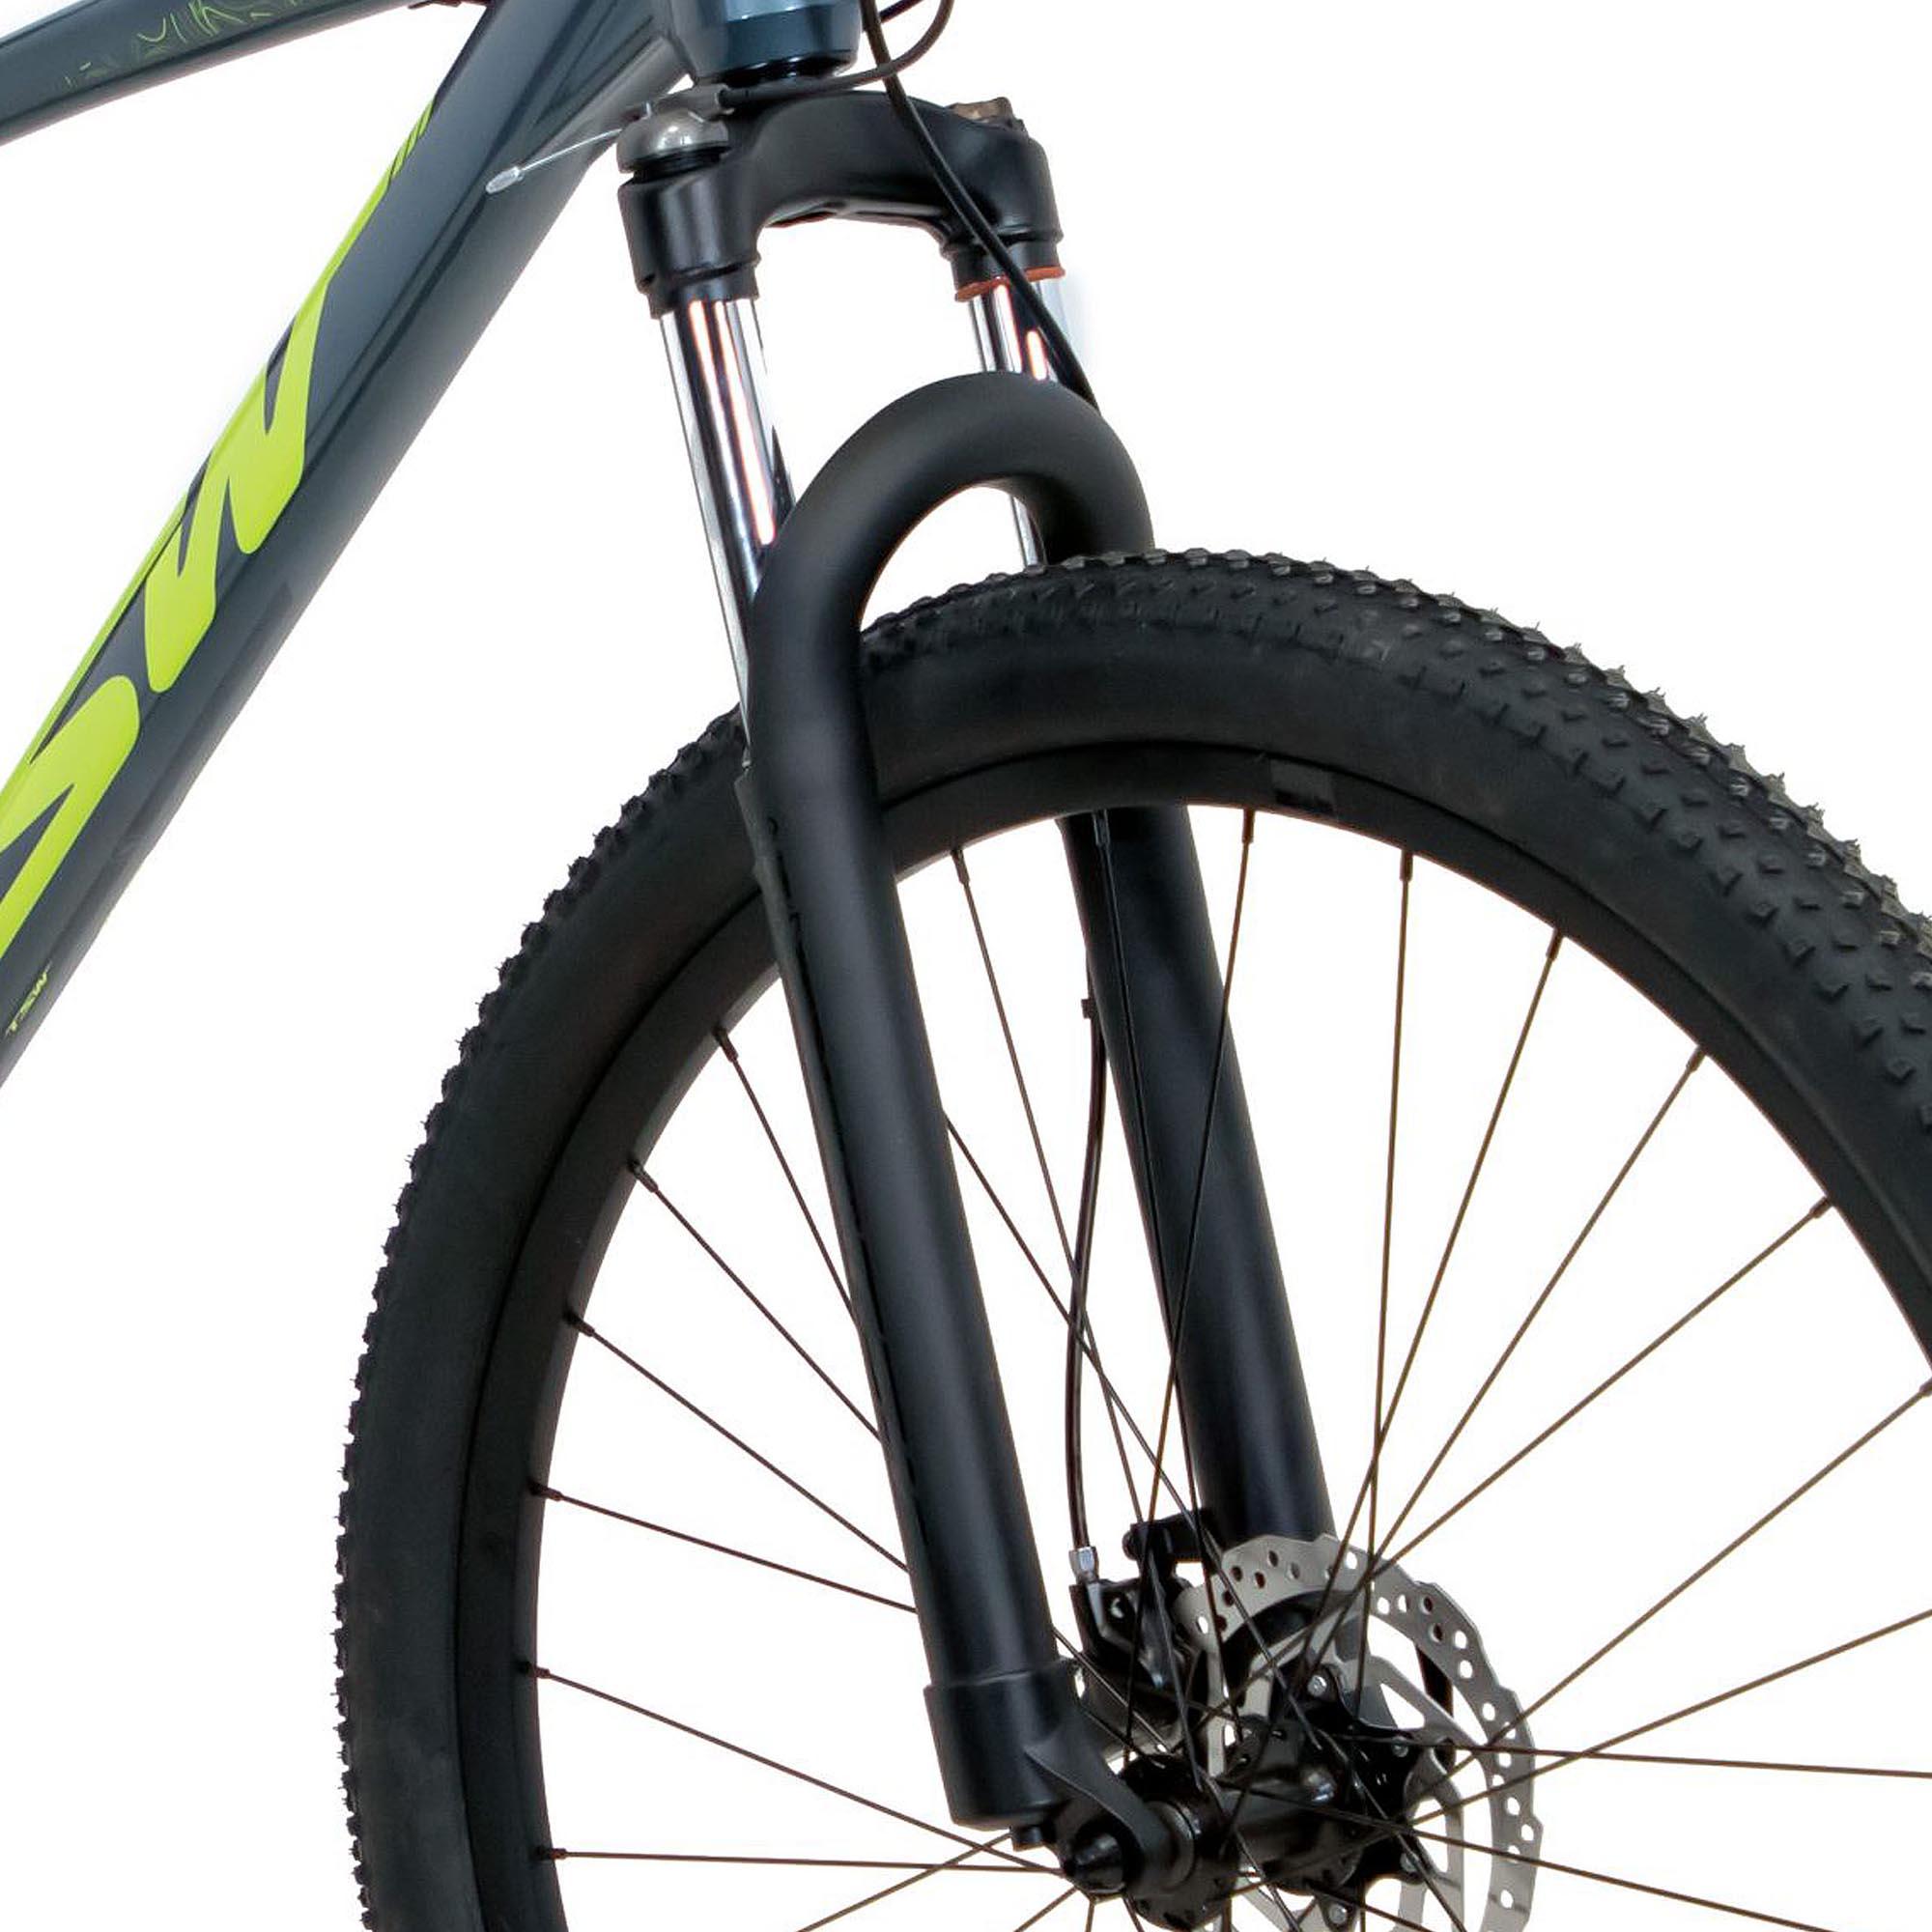 Bicicleta Aro 29 TSW Hunch Shimano Altus, Suspensão TSW, Freio Shimano